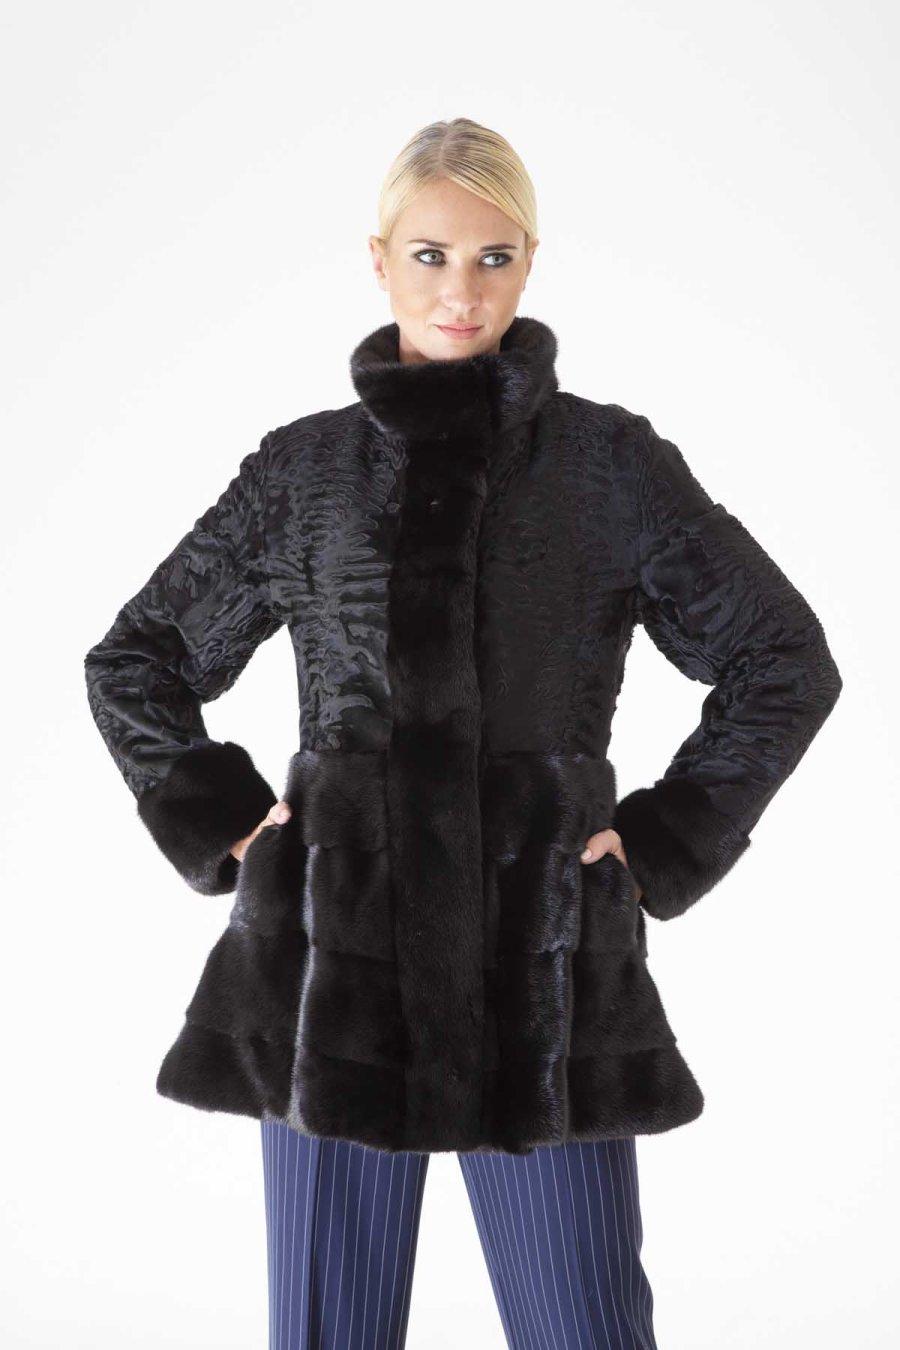 Blackglama Male Mink and Swakara Skin Jacket | Sarigianni Furs